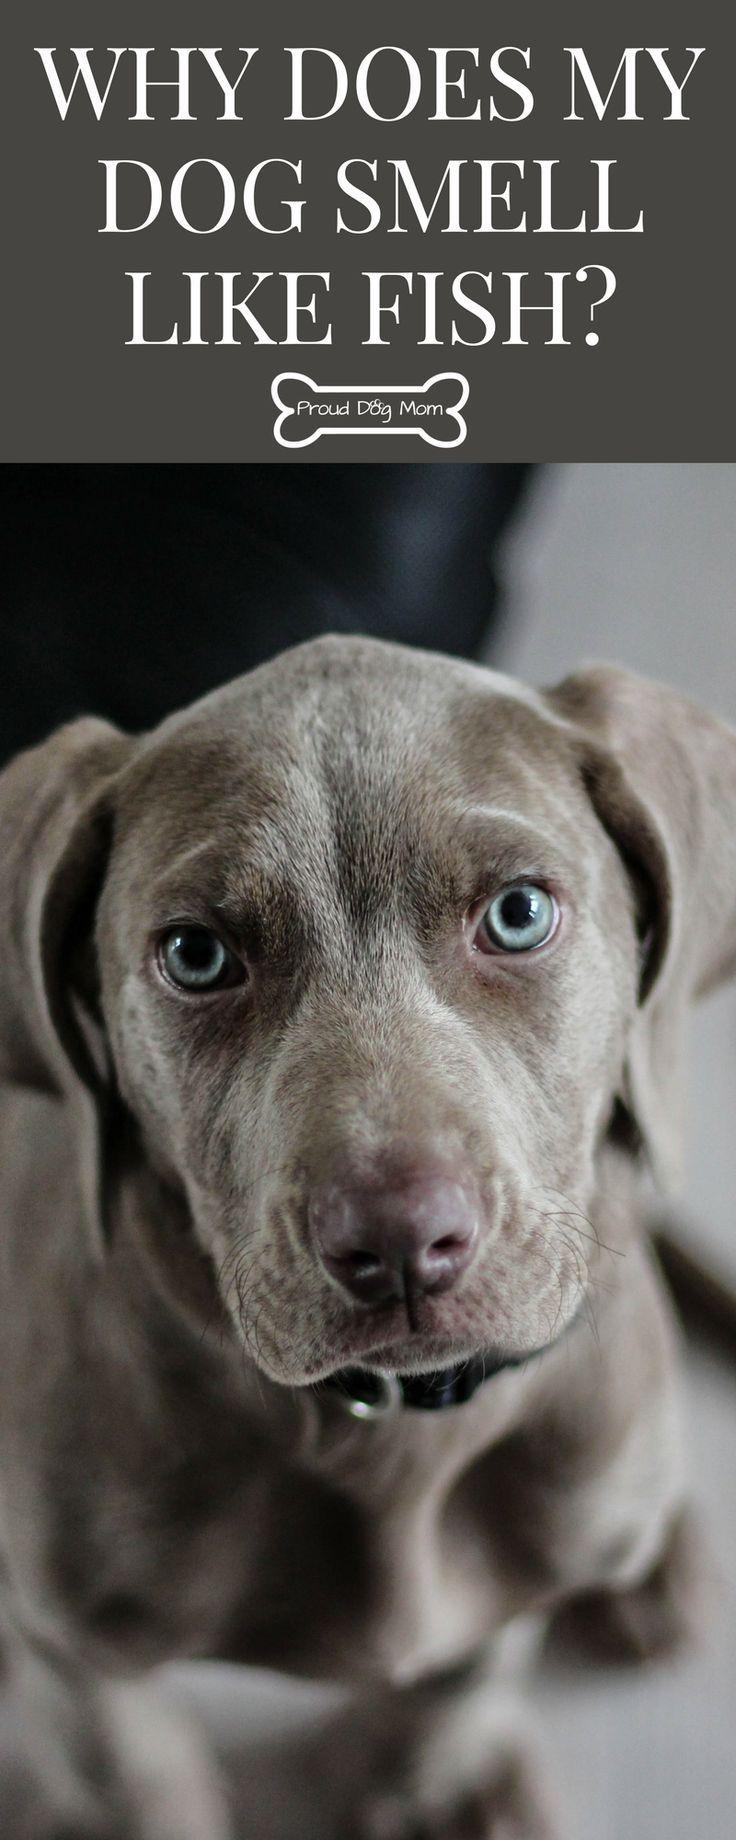 Why Does My Dog Smell Like Fish? Dog smells, Dog health